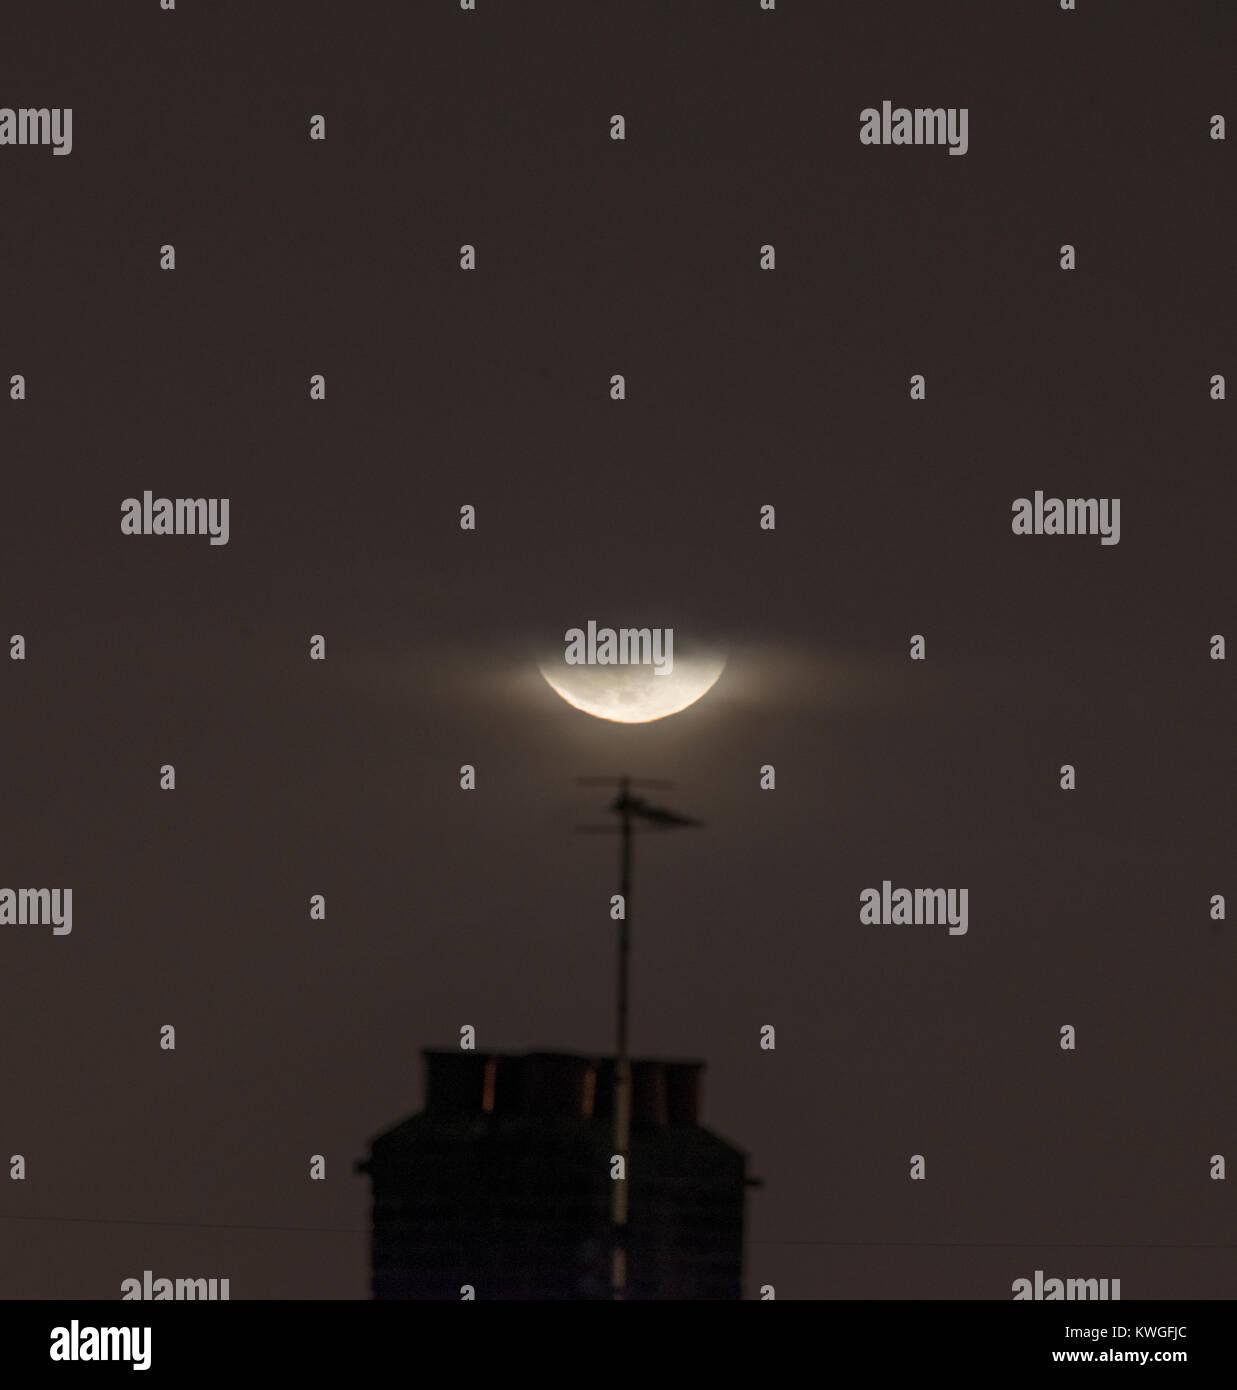 London, UK. 3 January 2018. 97% illuminated Waning Gibbous Moon rises through cloudy sky above London suburban rooftops, - Stock Image